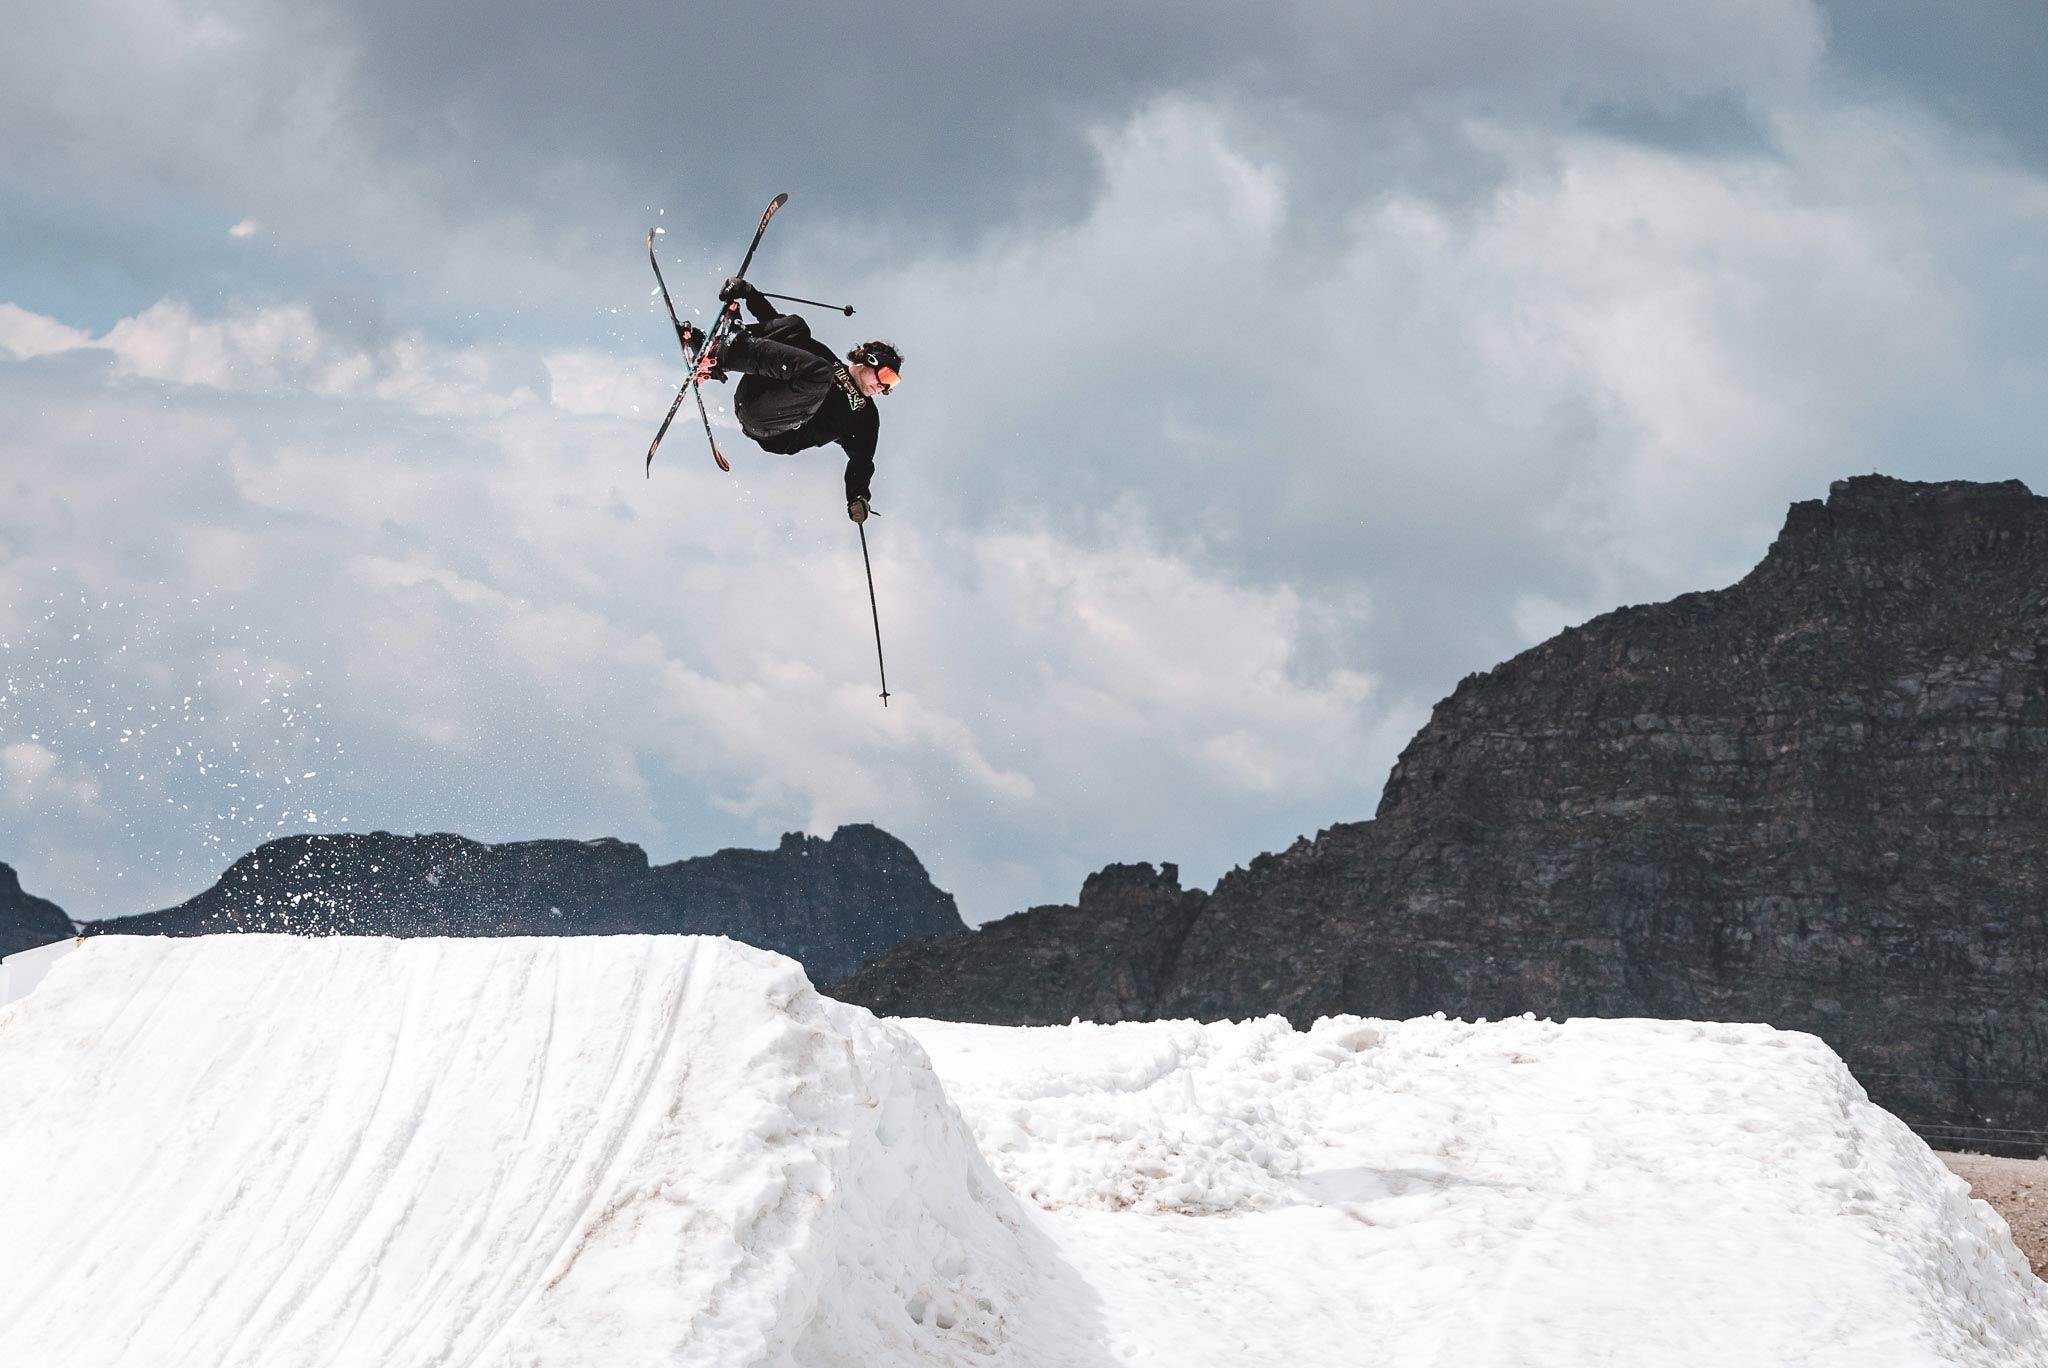 Rider: Bojan Stankovic